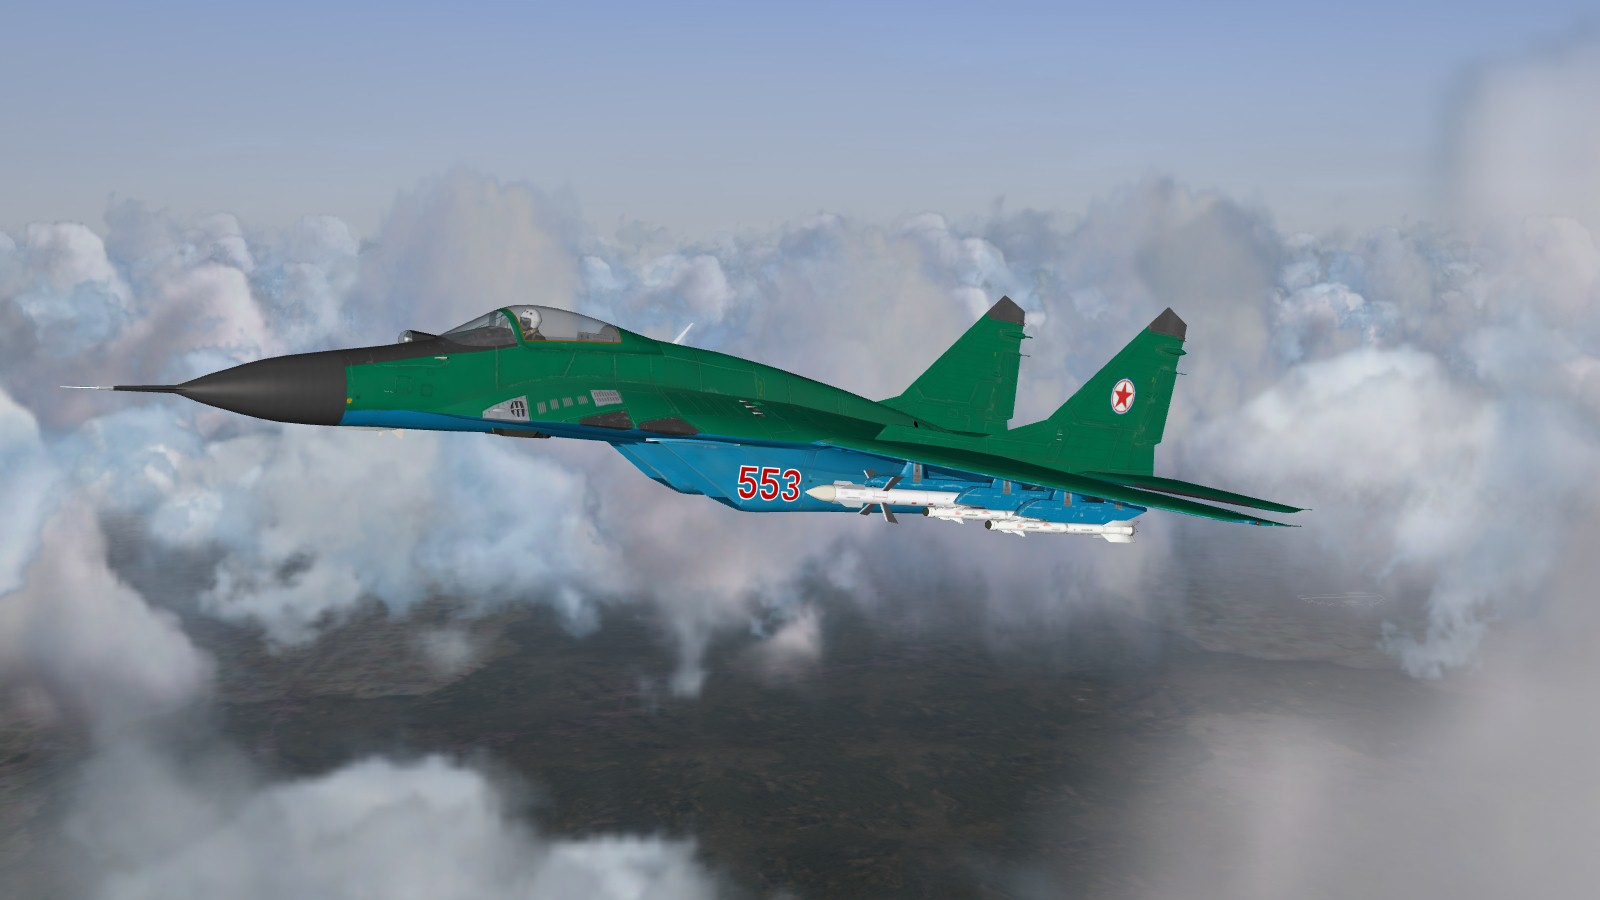 North Korea People's Air Force MiG-29